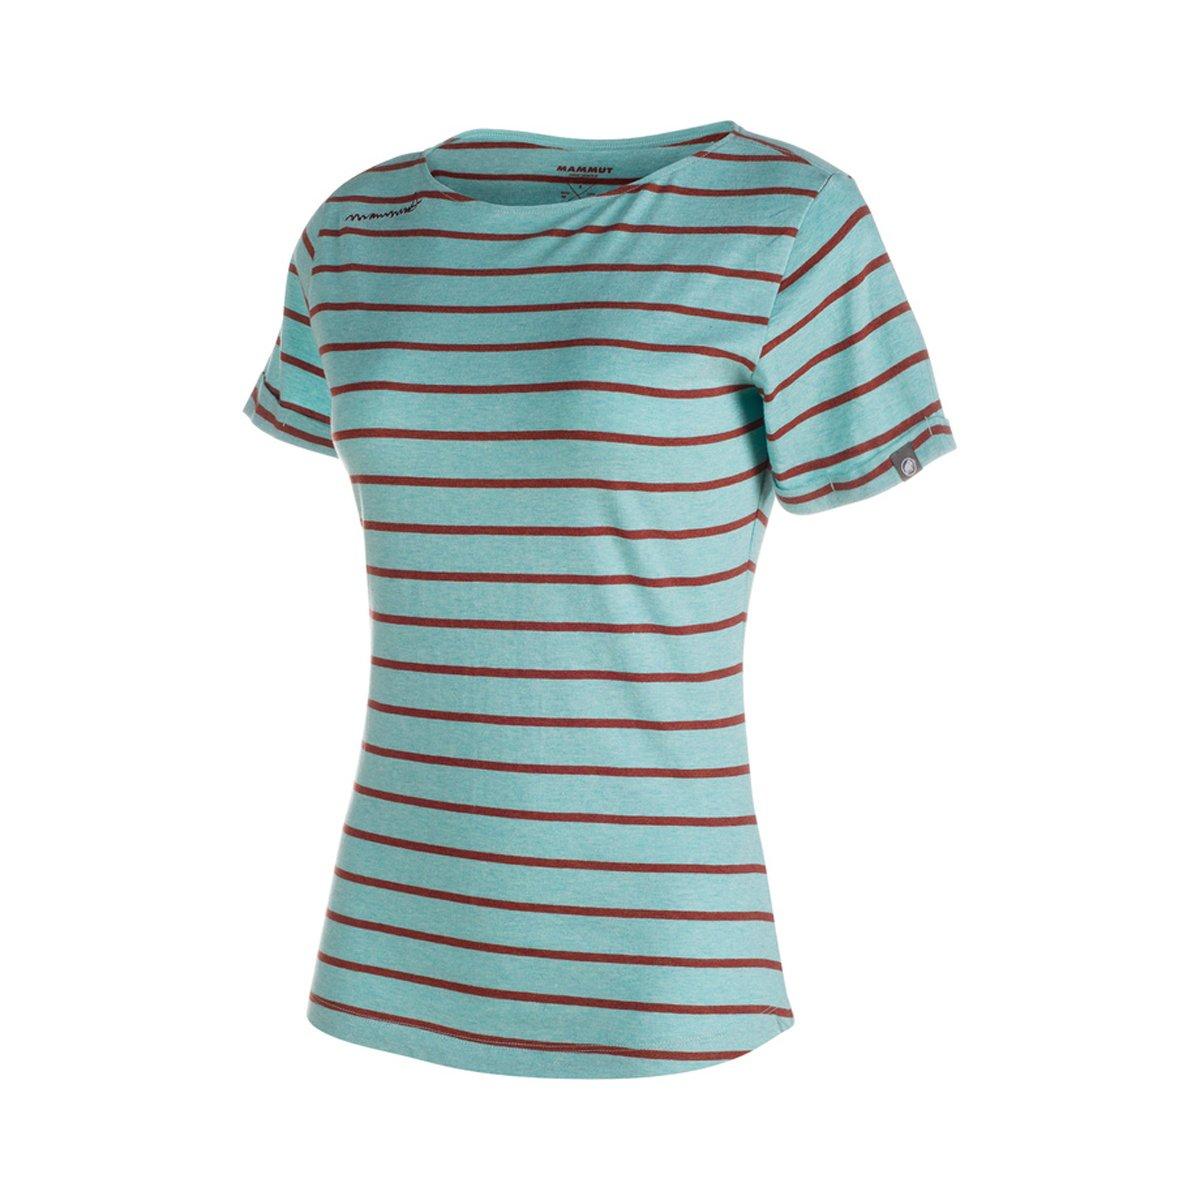 Mammut CeROTo T-Shirt Damens - Baumwollshirt